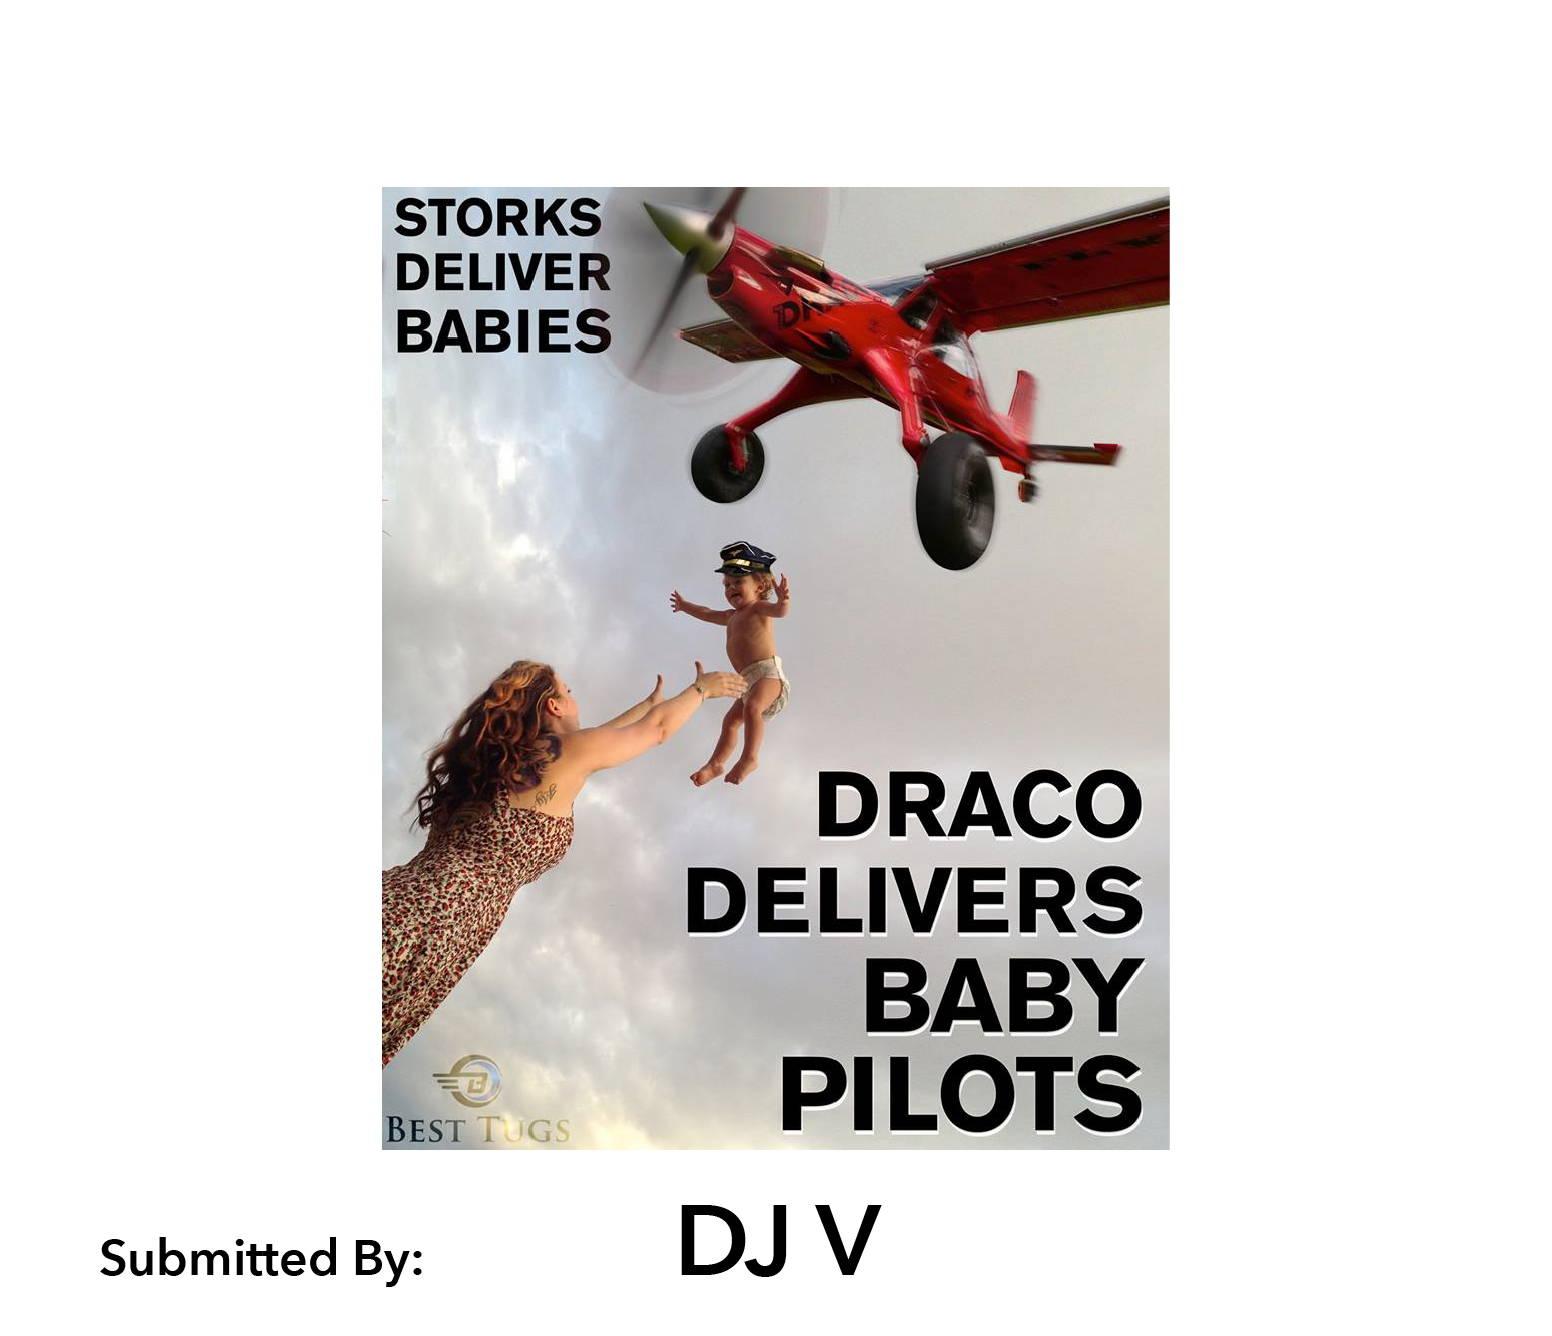 Draco – Best Tugs